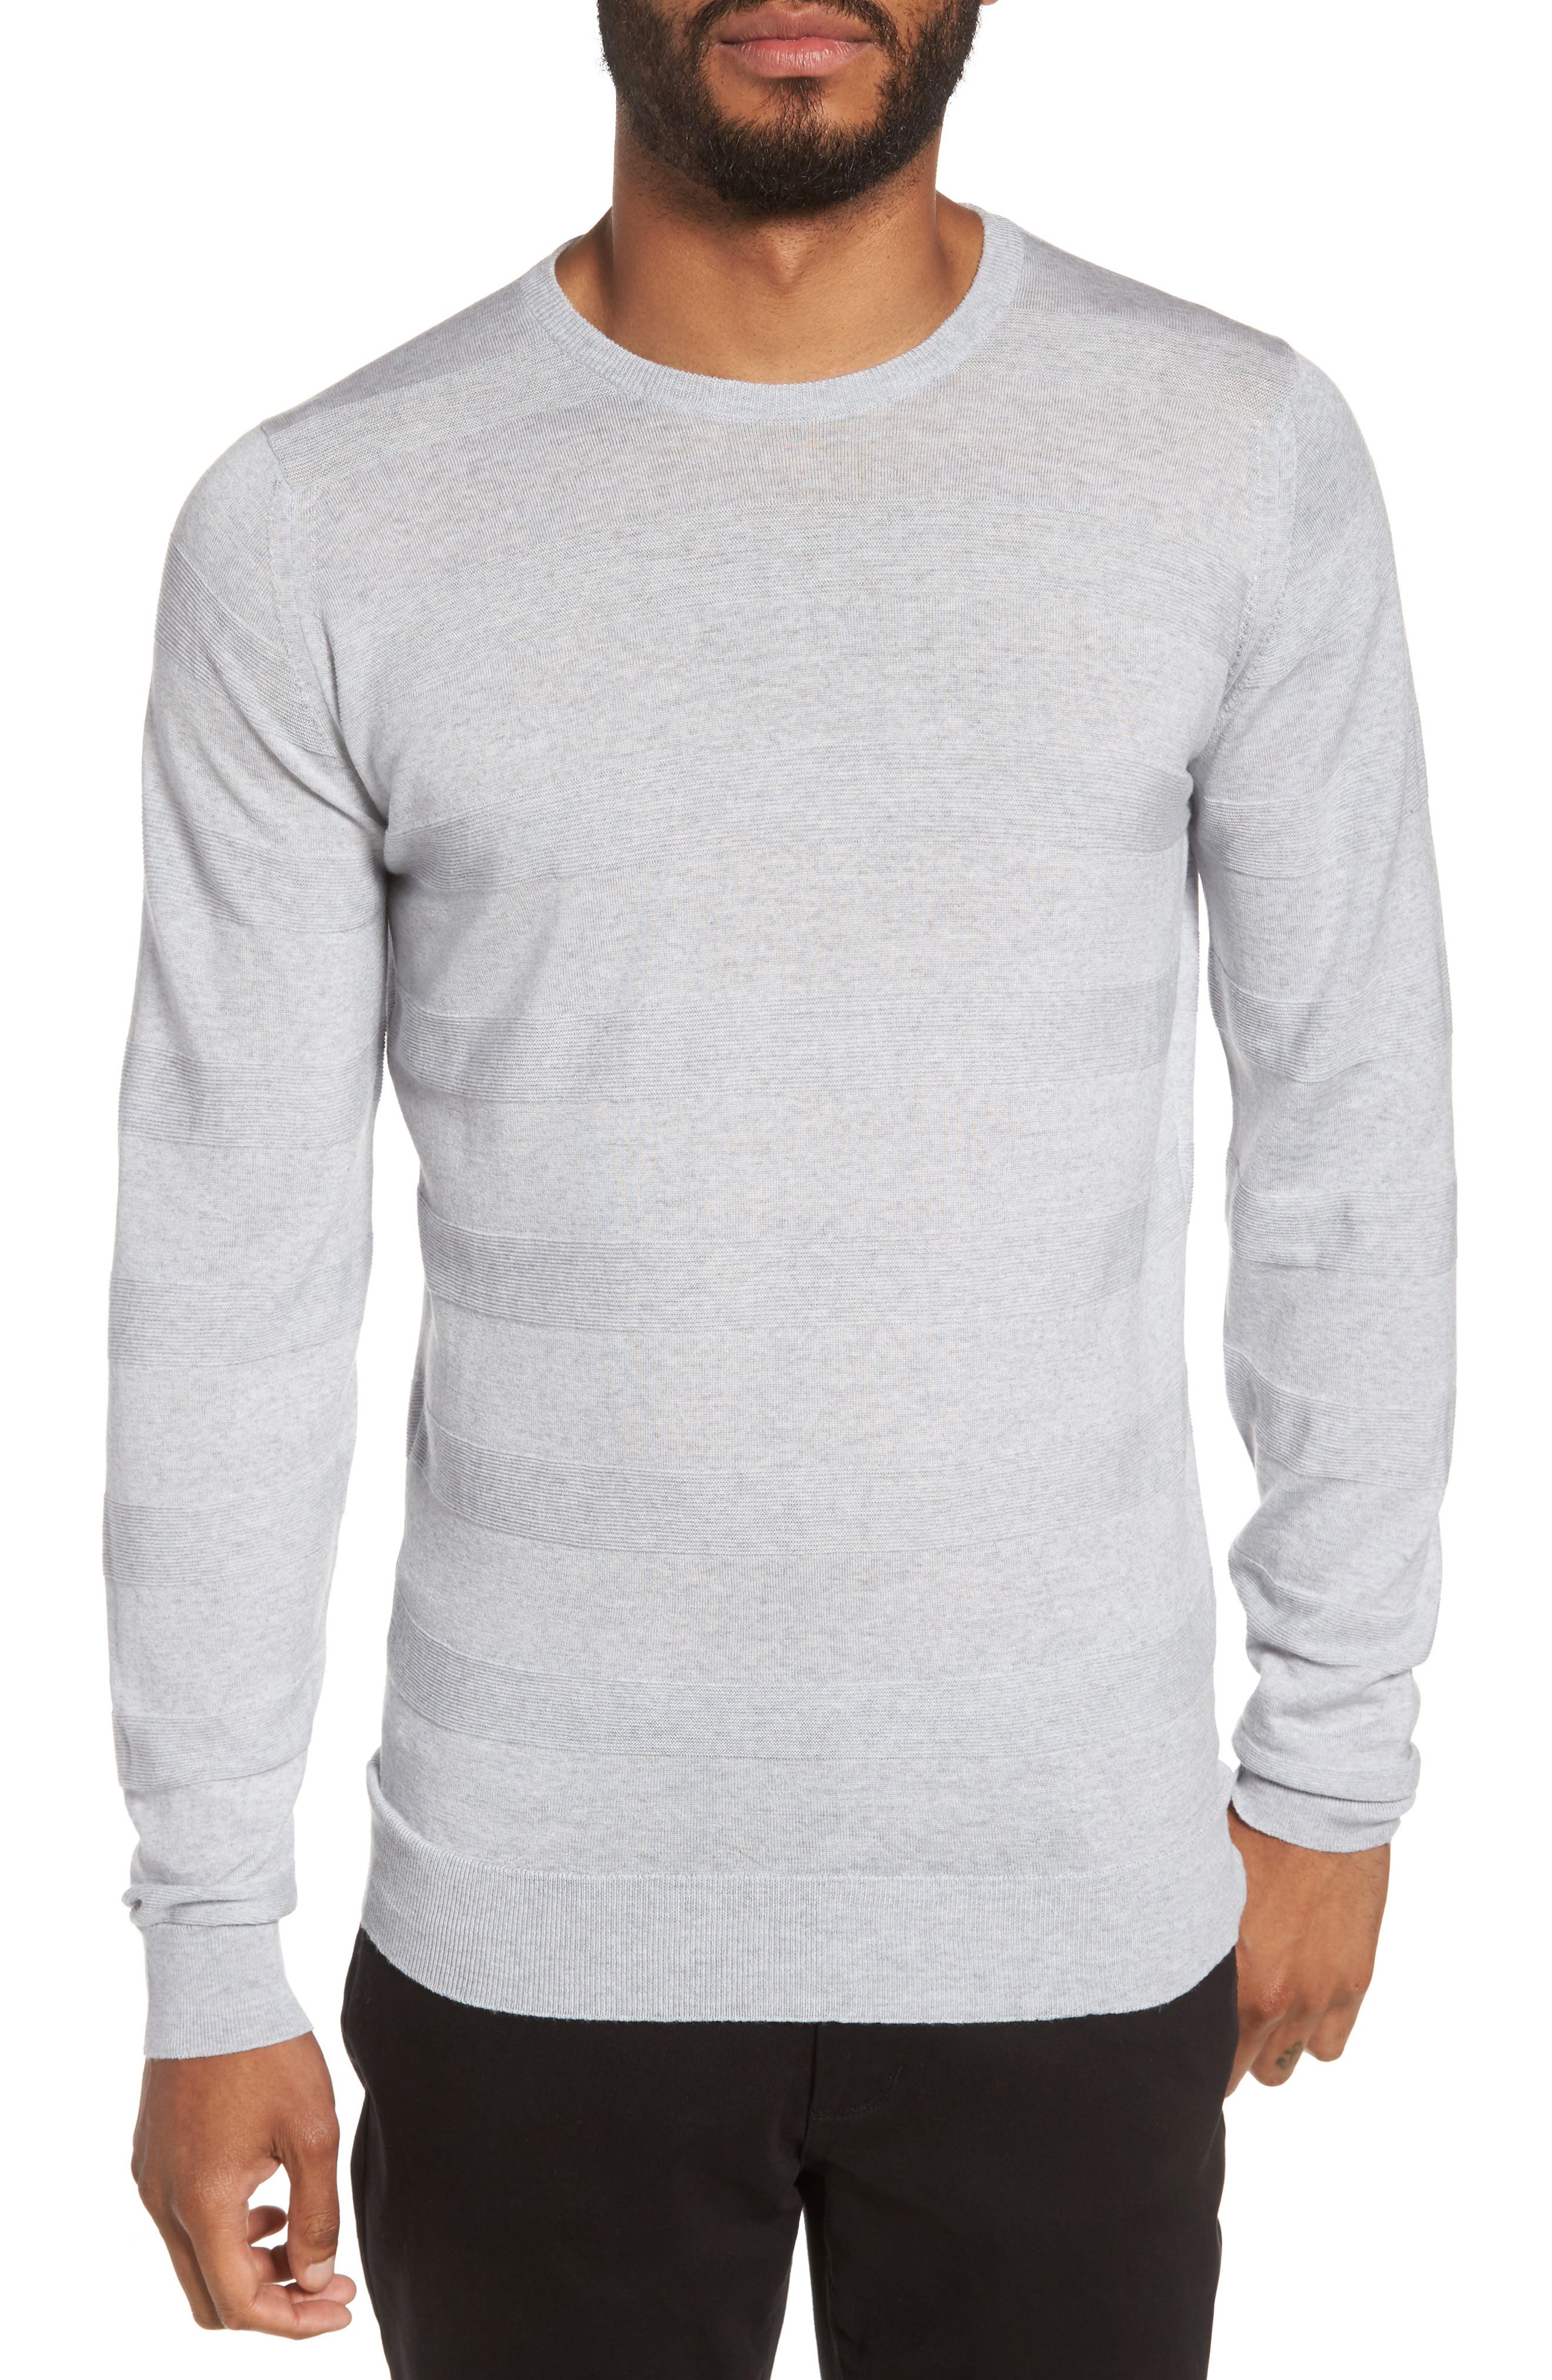 John Smedley Standard Fit Merino Wool Sweater